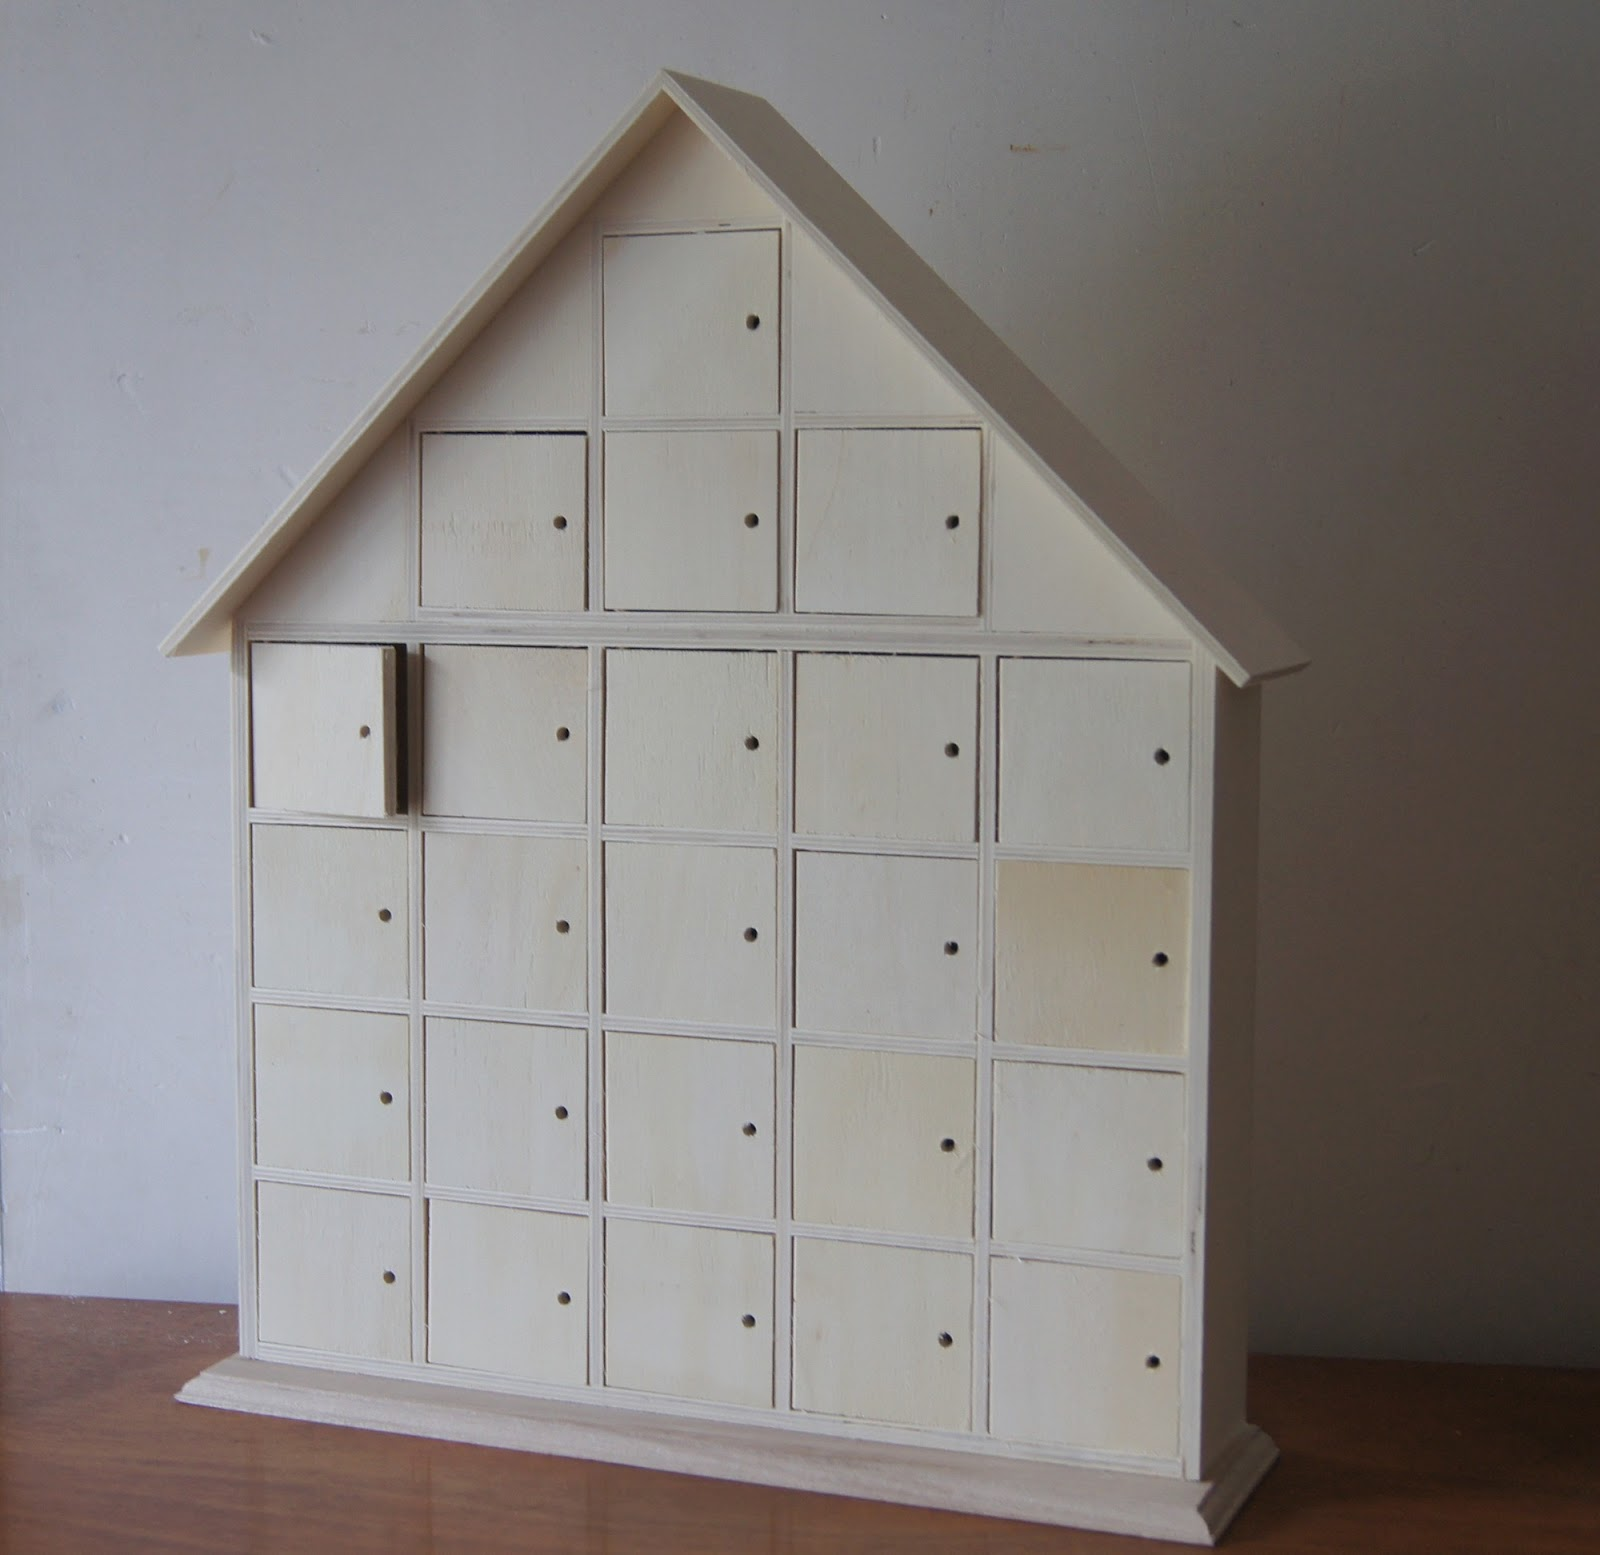 maison-calendrier-avent-bricolage